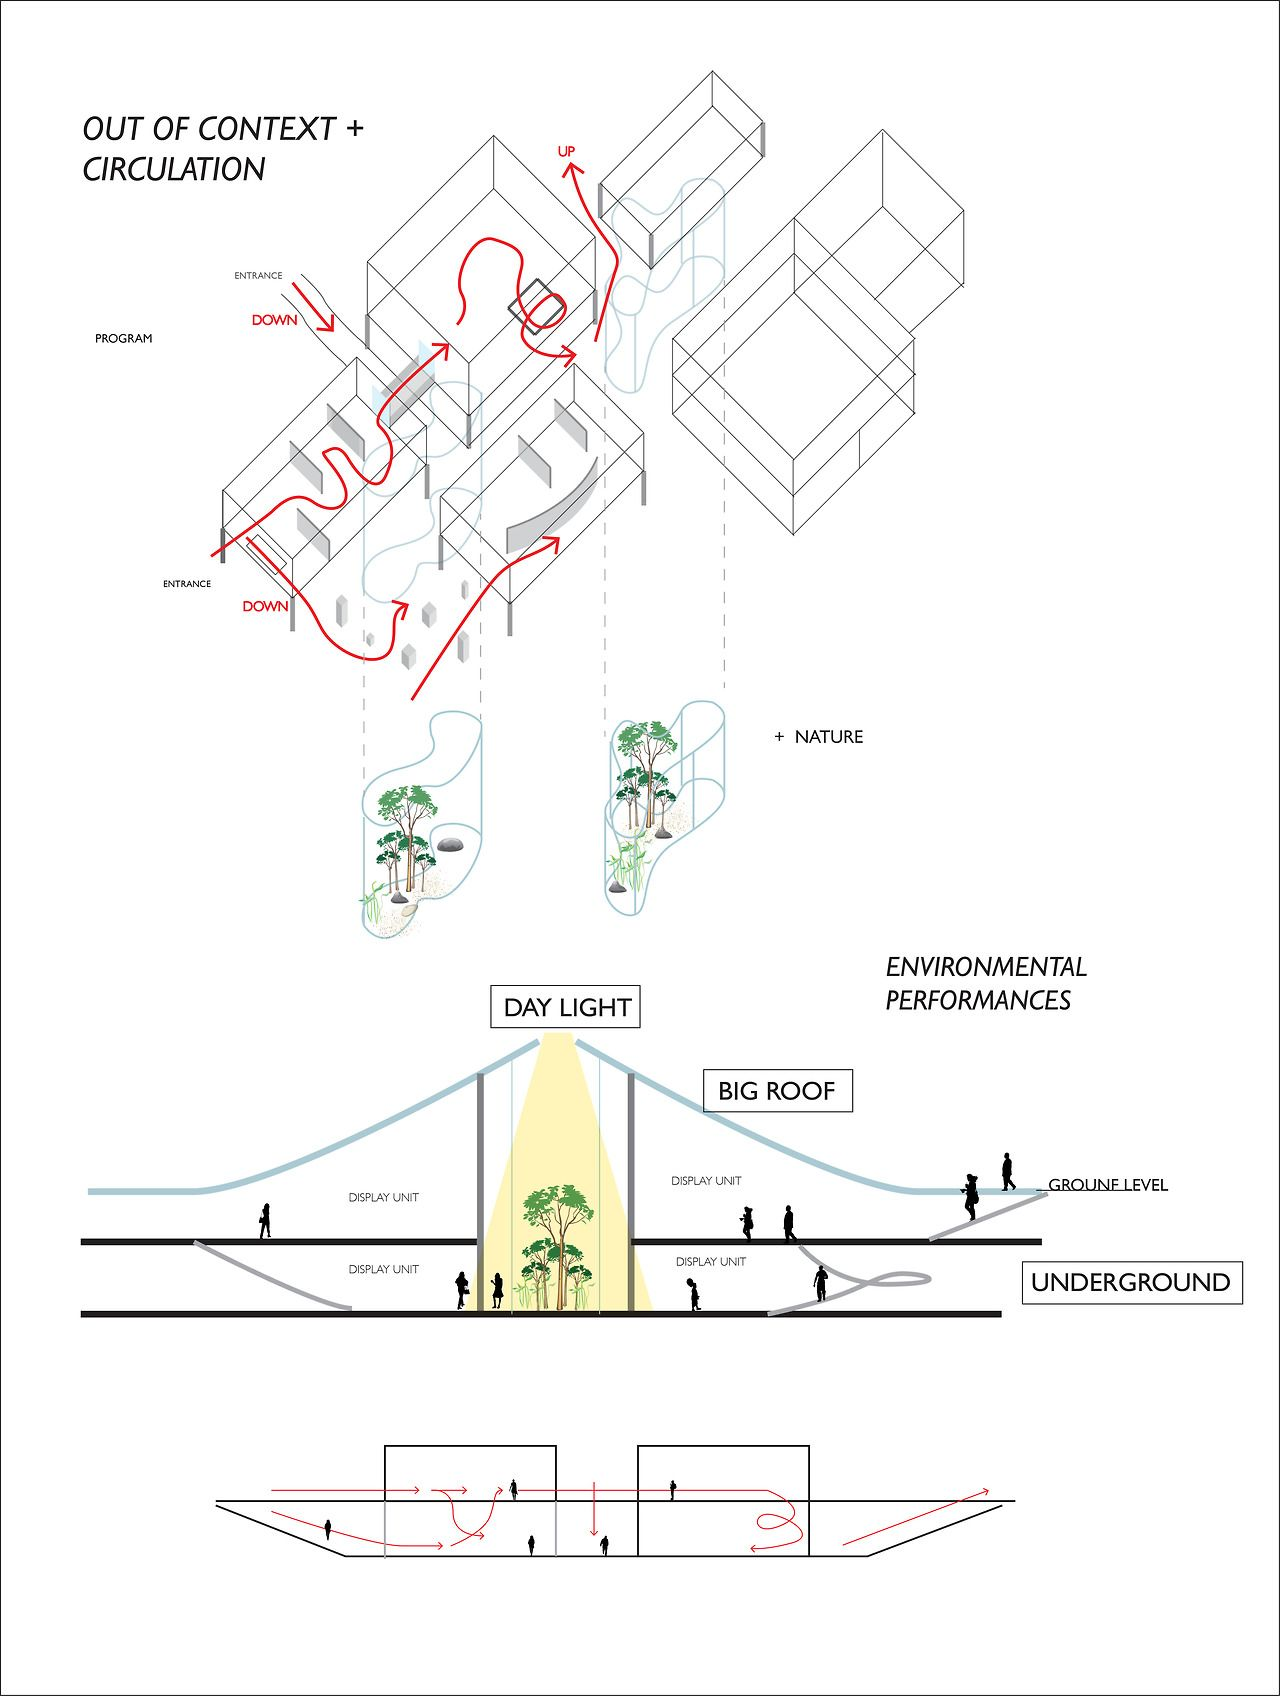 small resolution of chacha chanya niyomsith 5434726425 section and circulation diagram illustrating the environmental performances and circulation